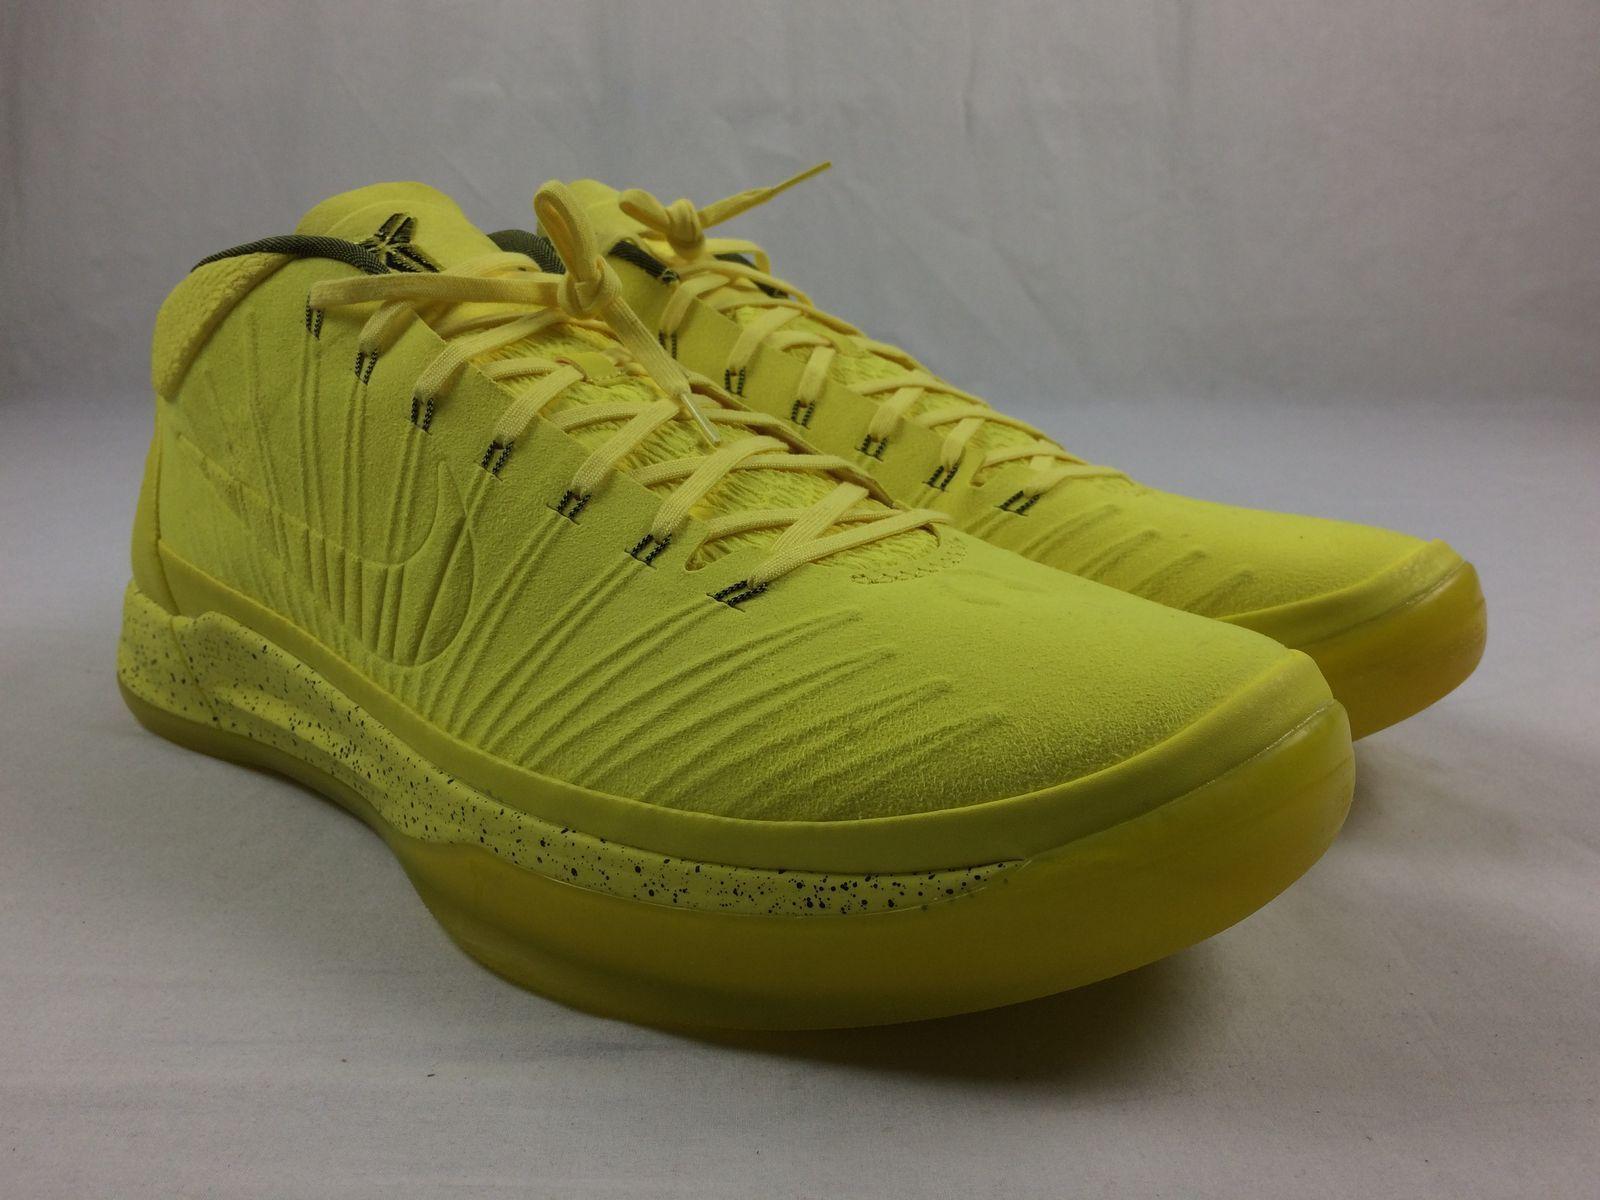 NEW Nike Kobe A.D. Sonic Yellow - Yellow Basketball Shoes (Men's 18)